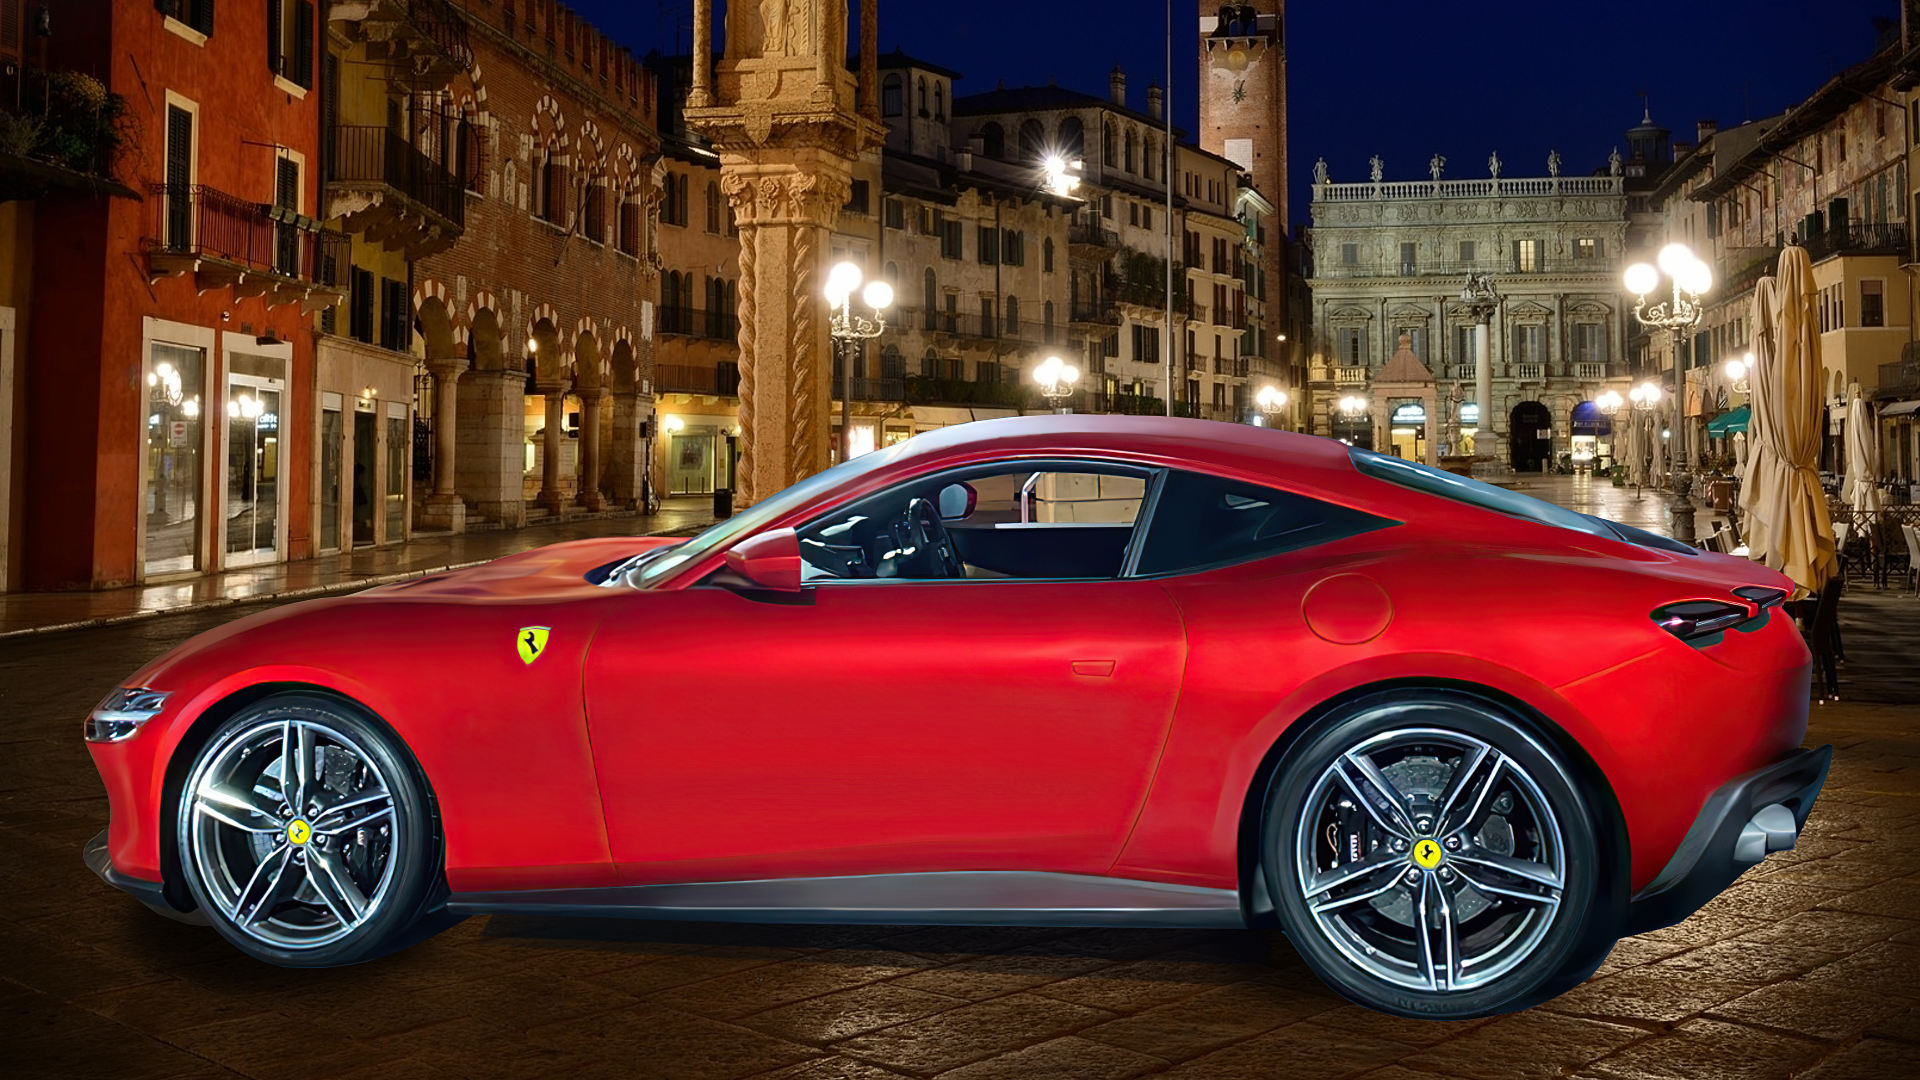 2020 Ferrari Roma Wallpaper Red